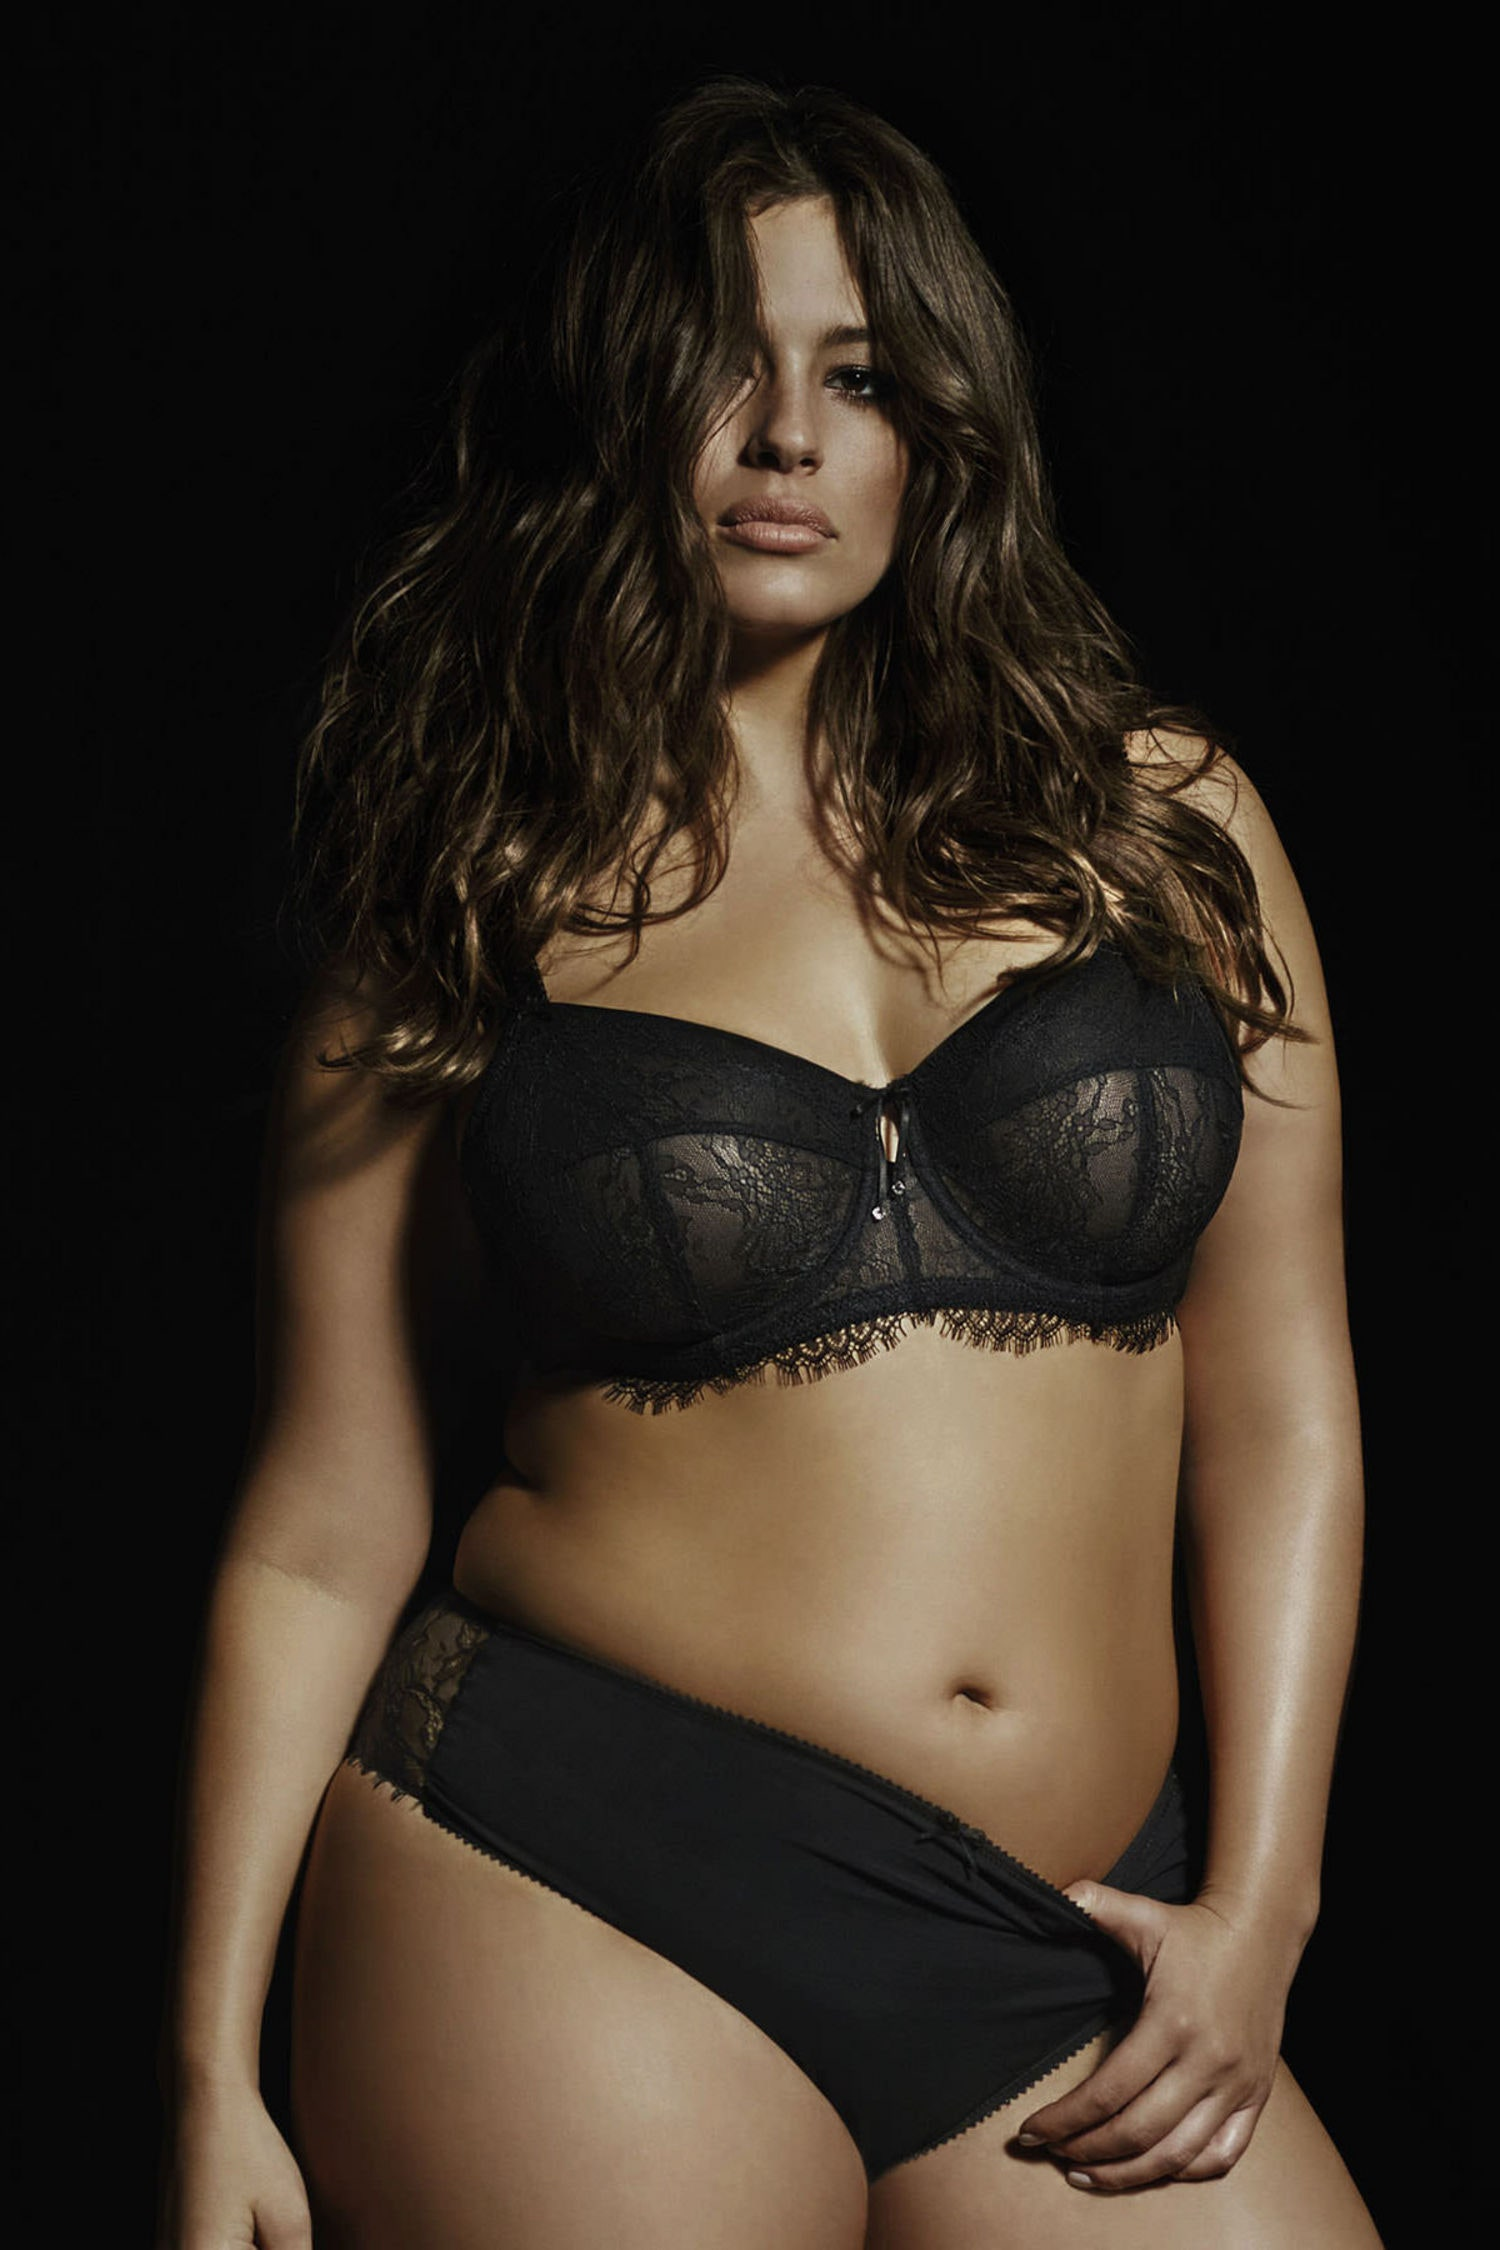 Big boobs in beautiful underwear